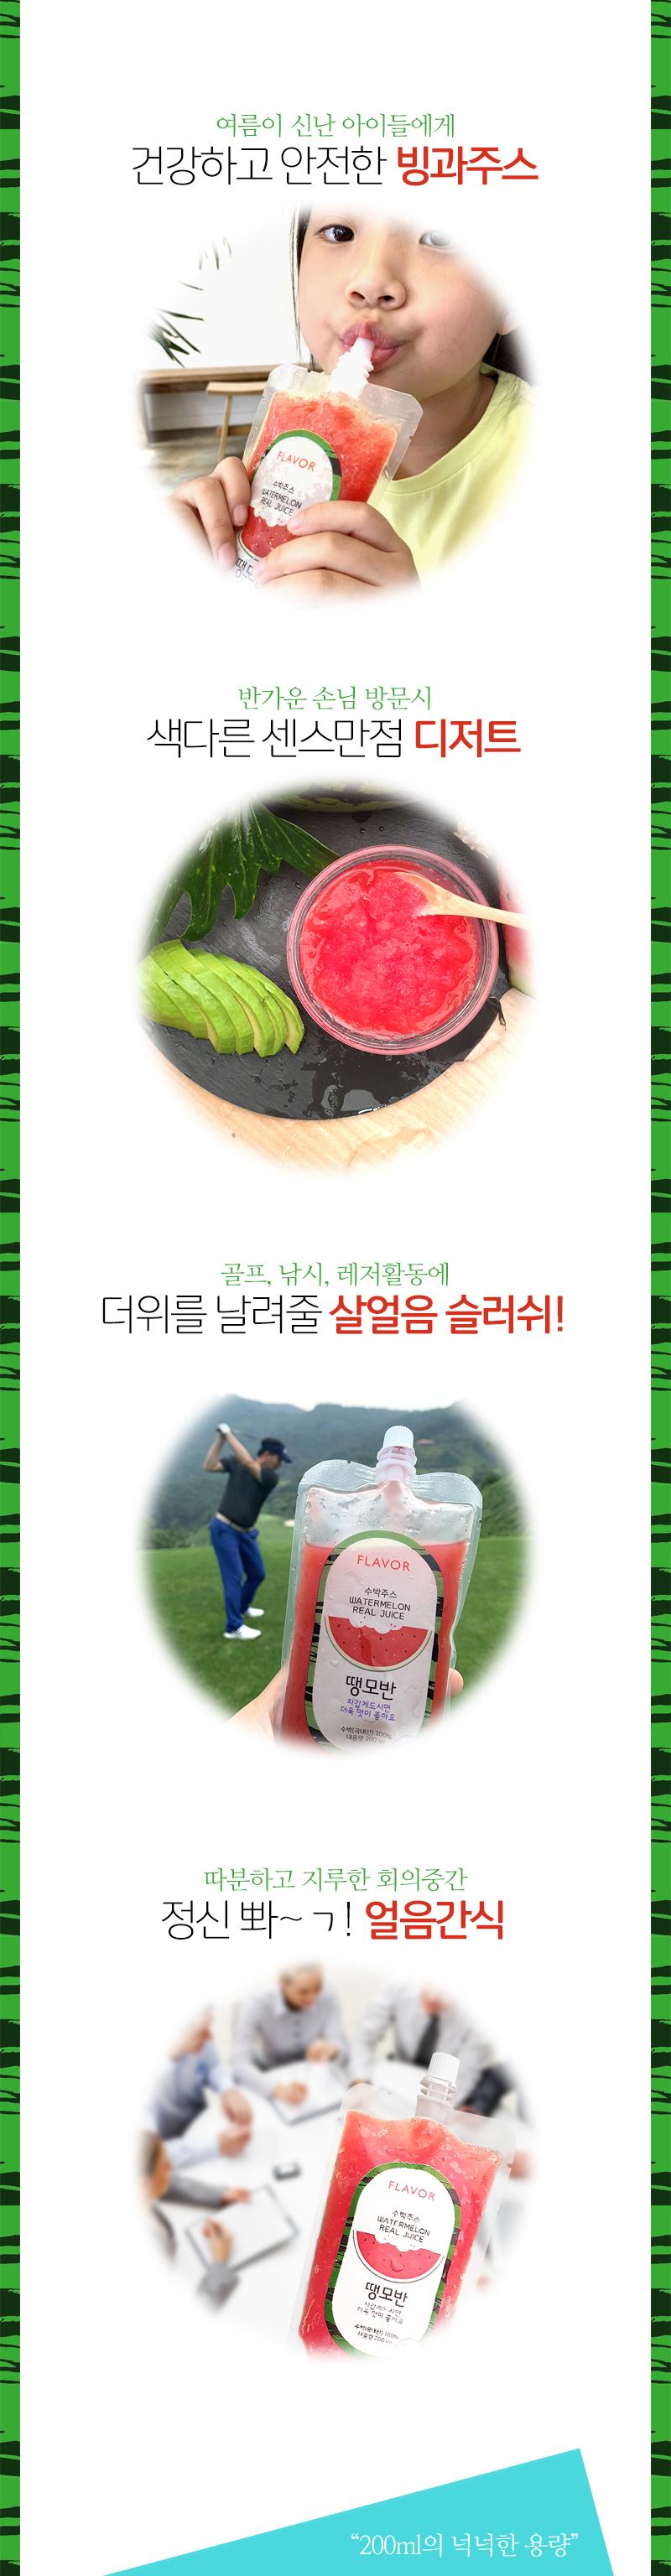 watermelon_detail_03.jpg